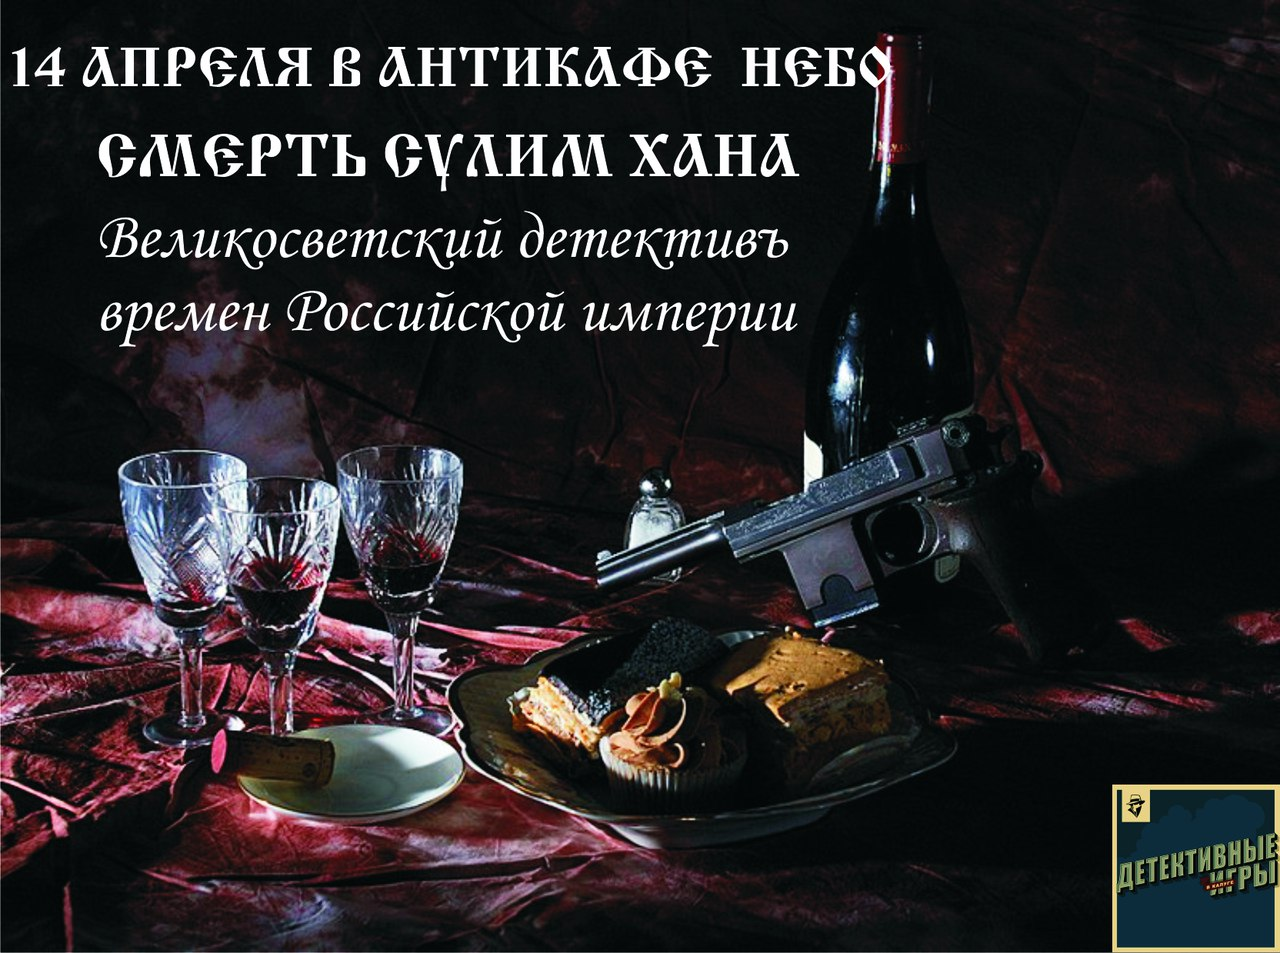 Афиша Калуга Смерть Сулим-Хана - 14.04.2016